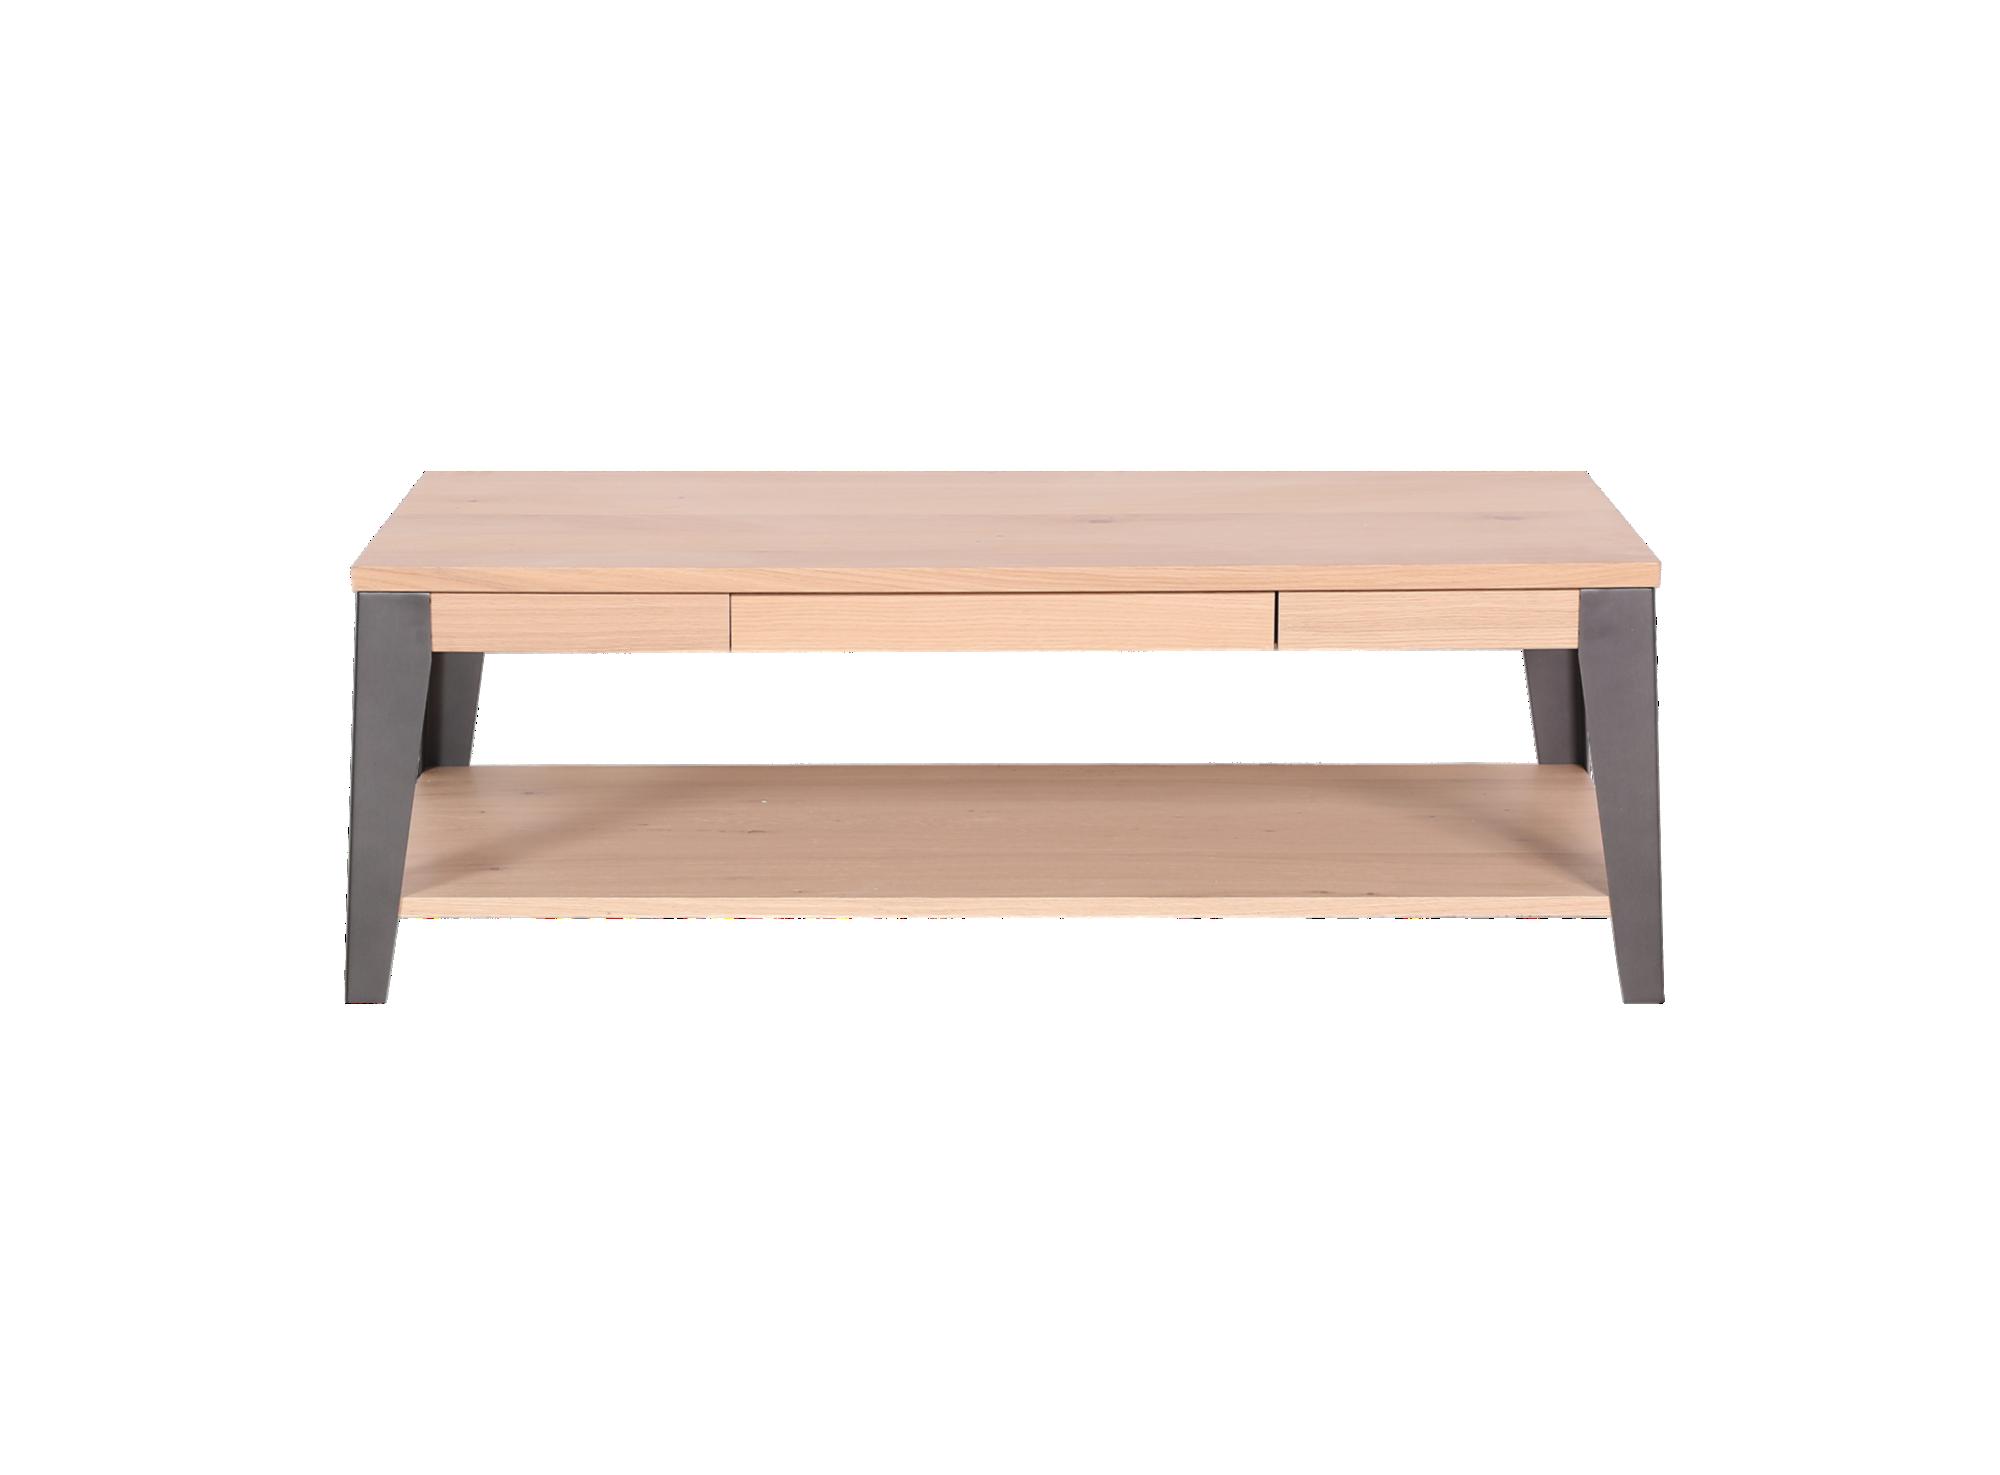 Einzigartig table basse rallonge id es de conception de - Table basse a rallonge ...